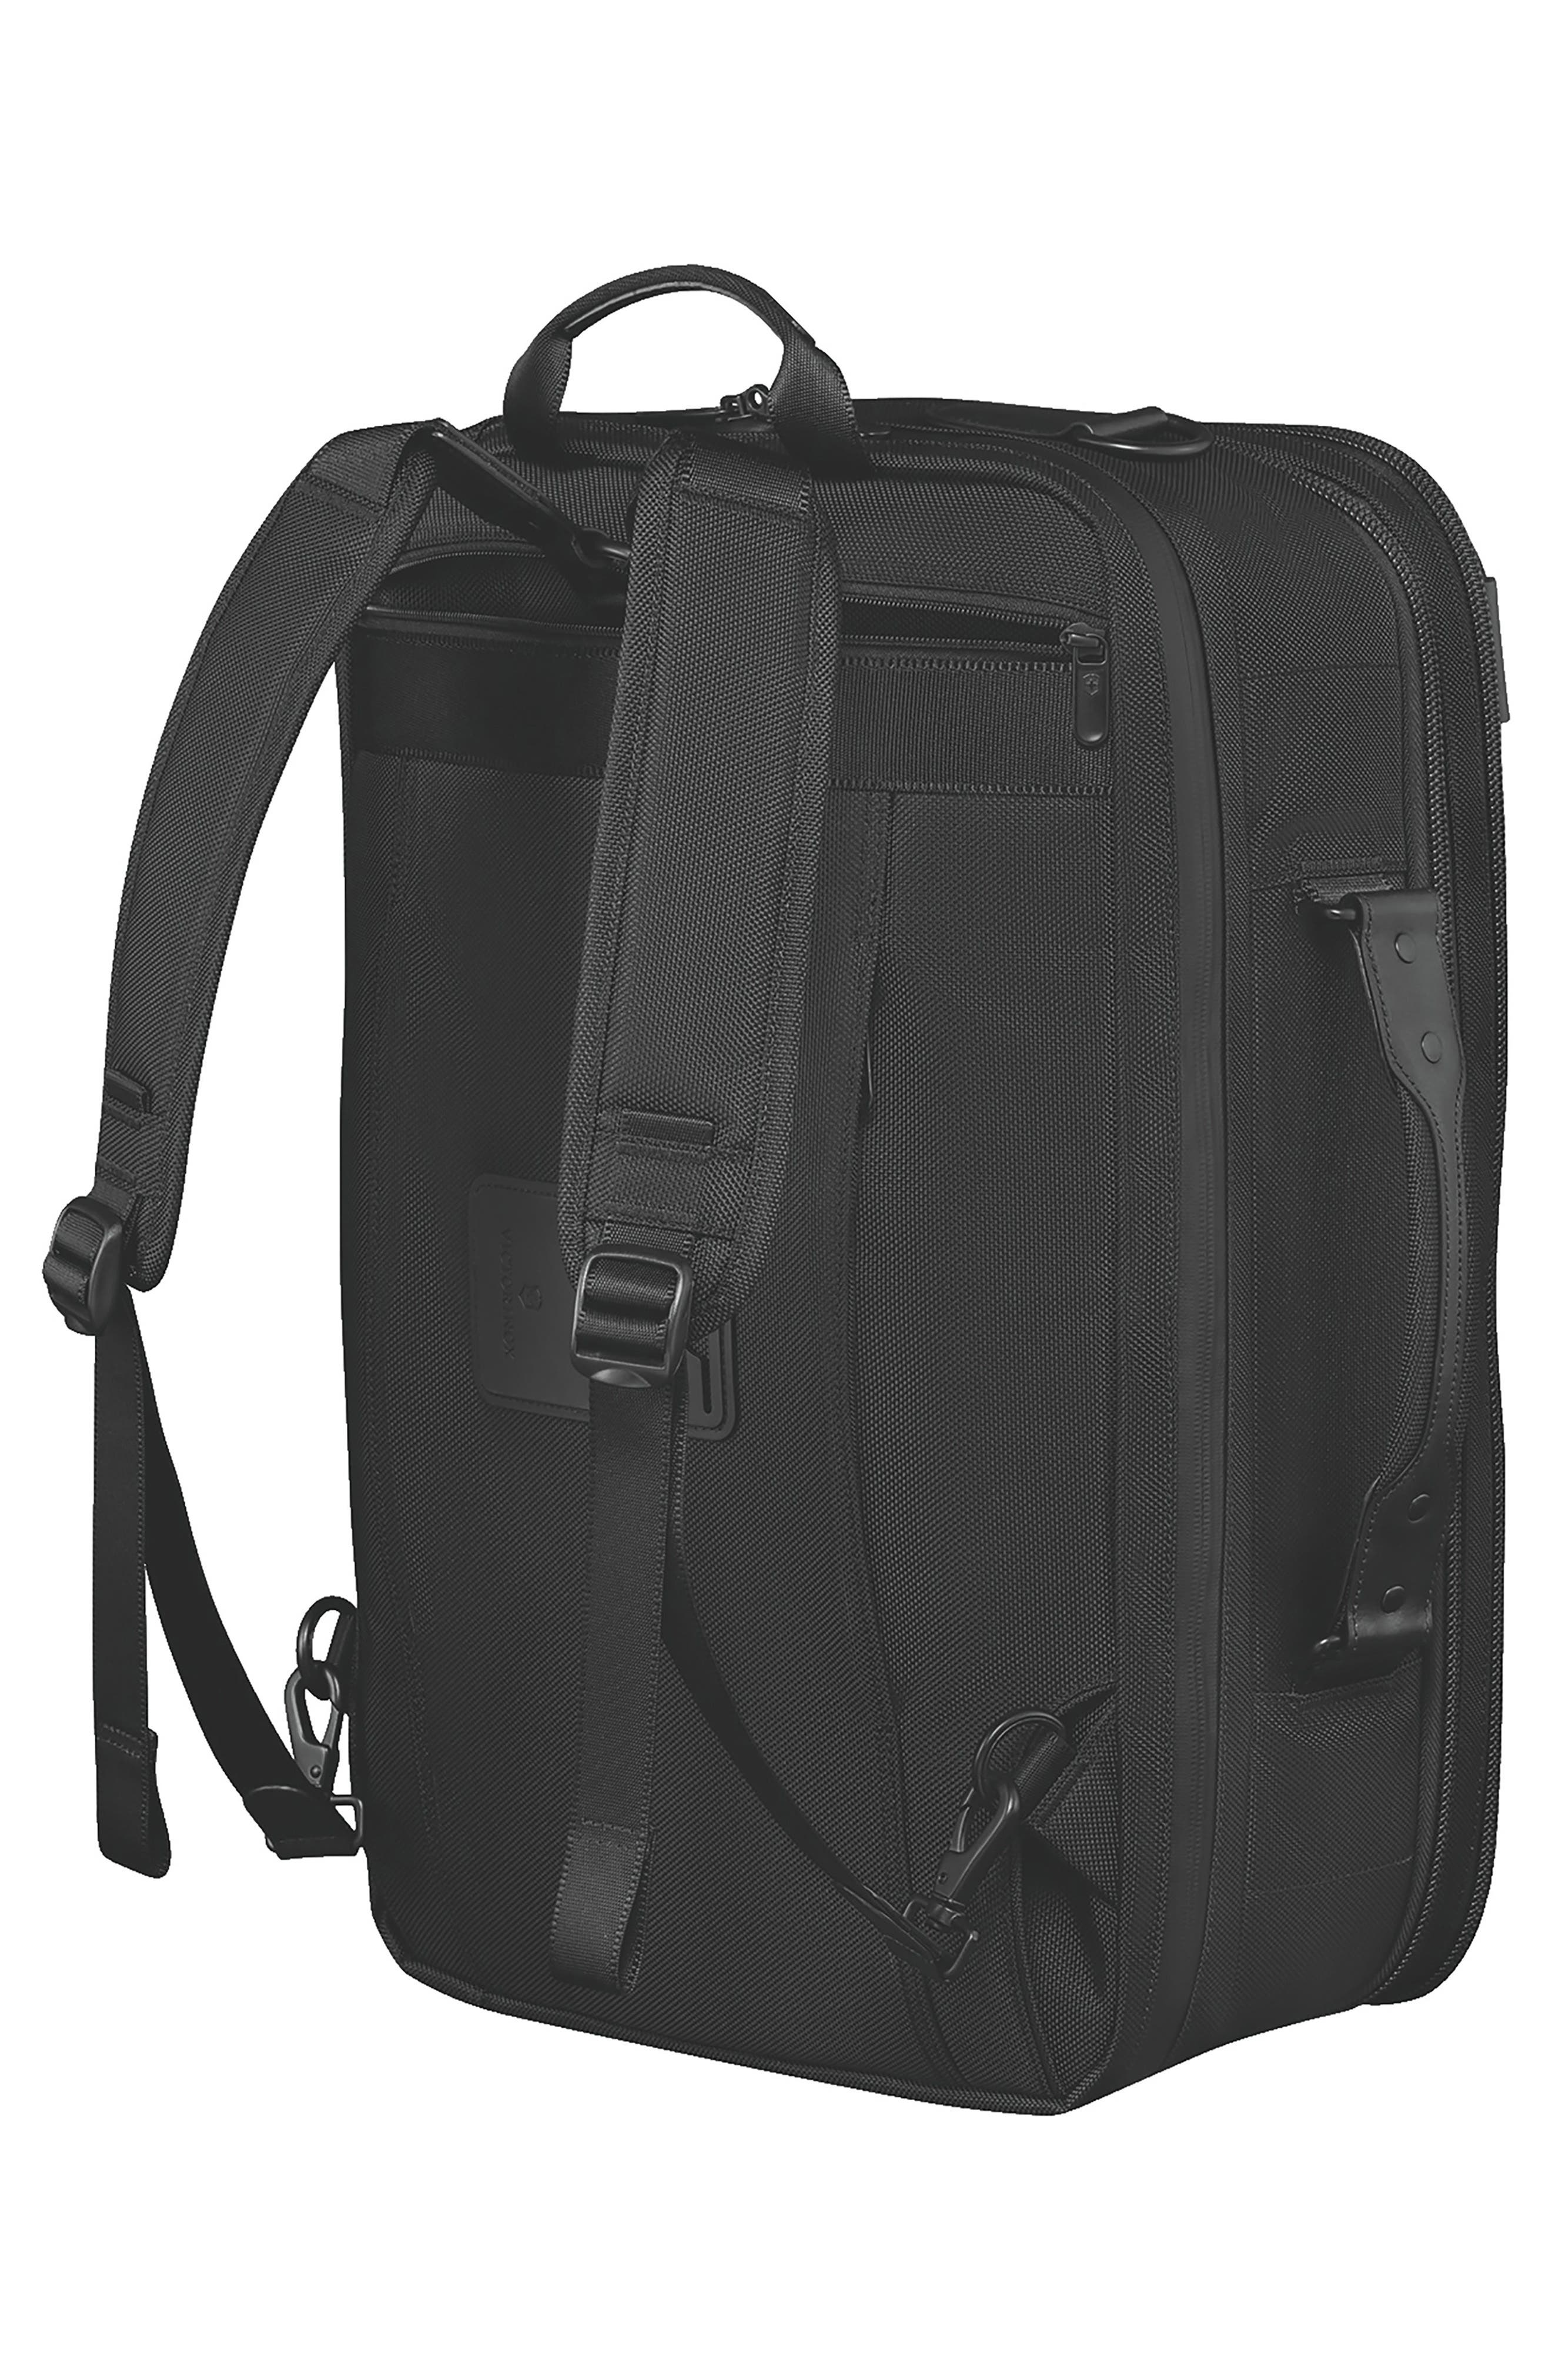 Lexicon 2.0 Convertible Backpack,                             Alternate thumbnail 4, color,                             001